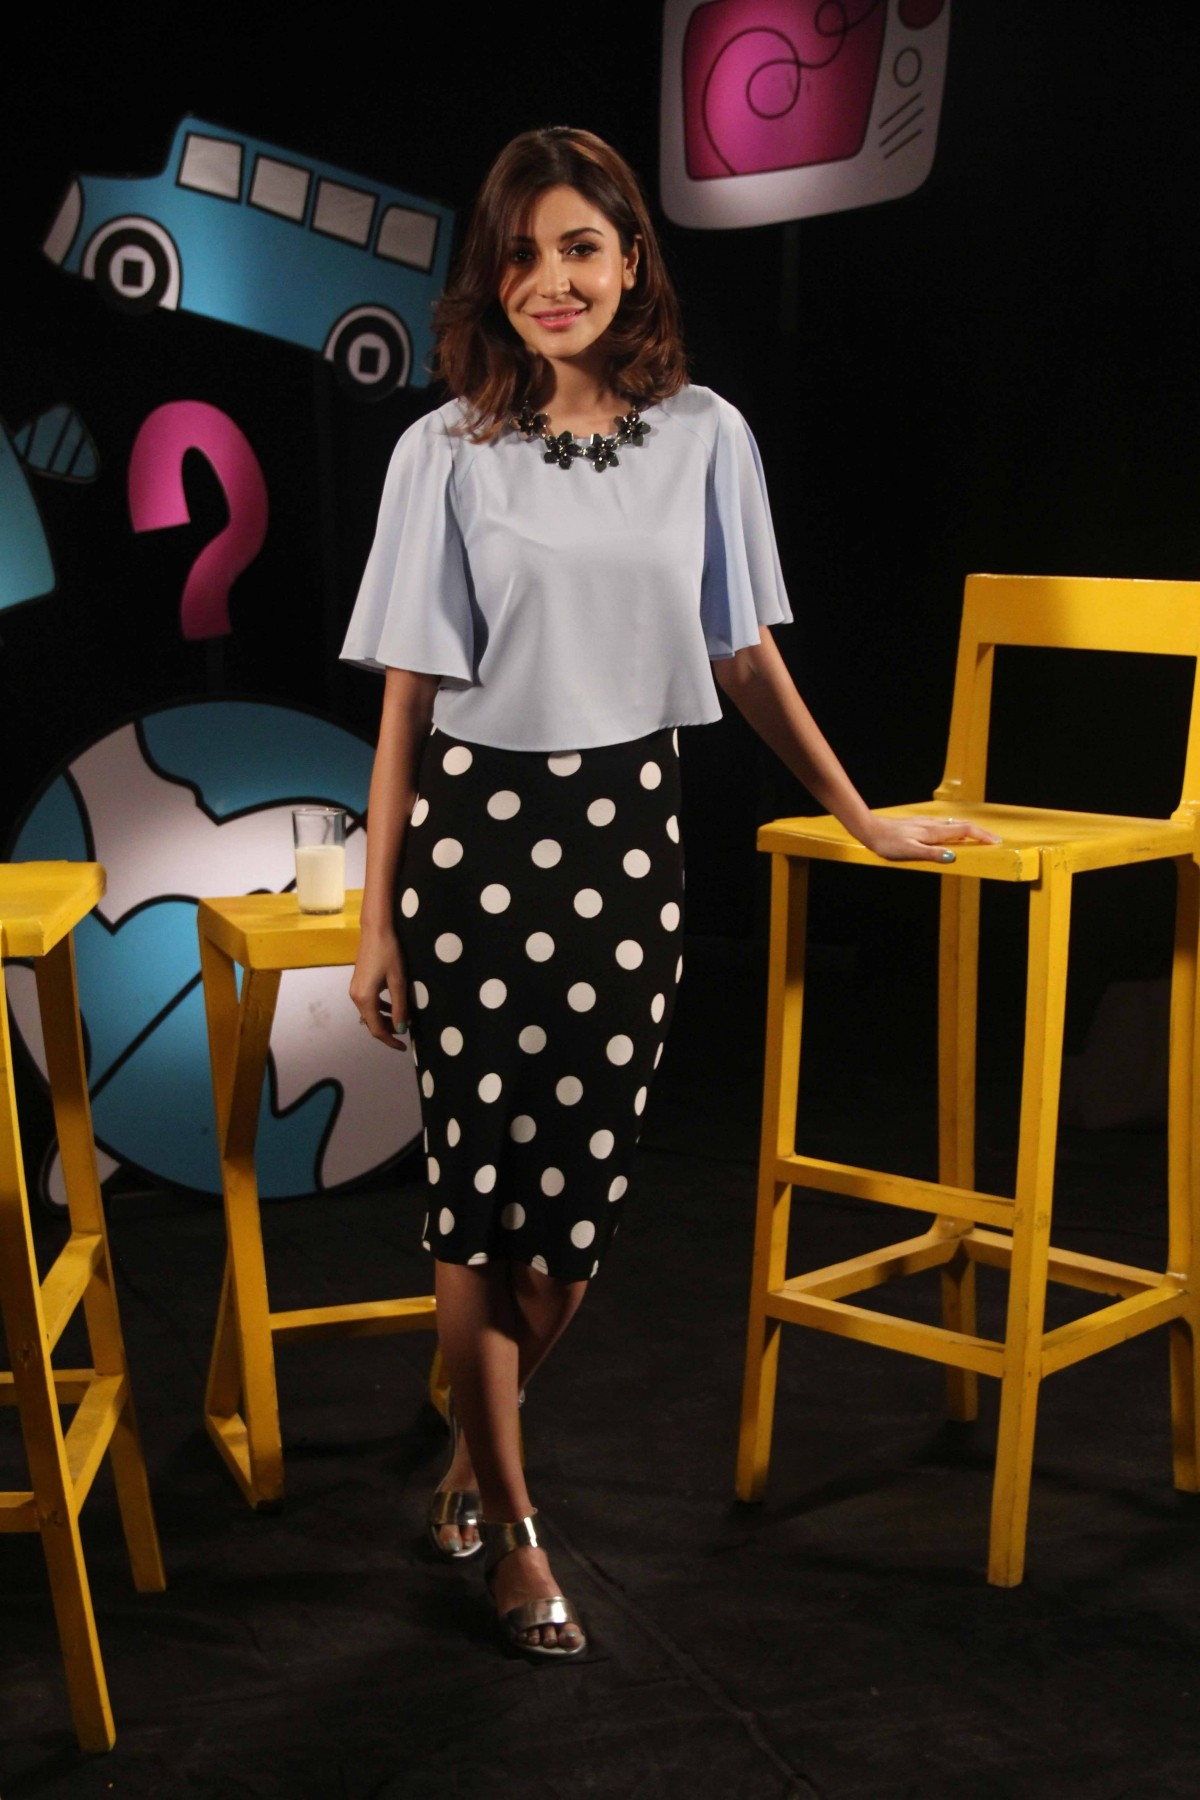 Anushka Sharma promotes 'PK' on Captain Tiao's Talk Show